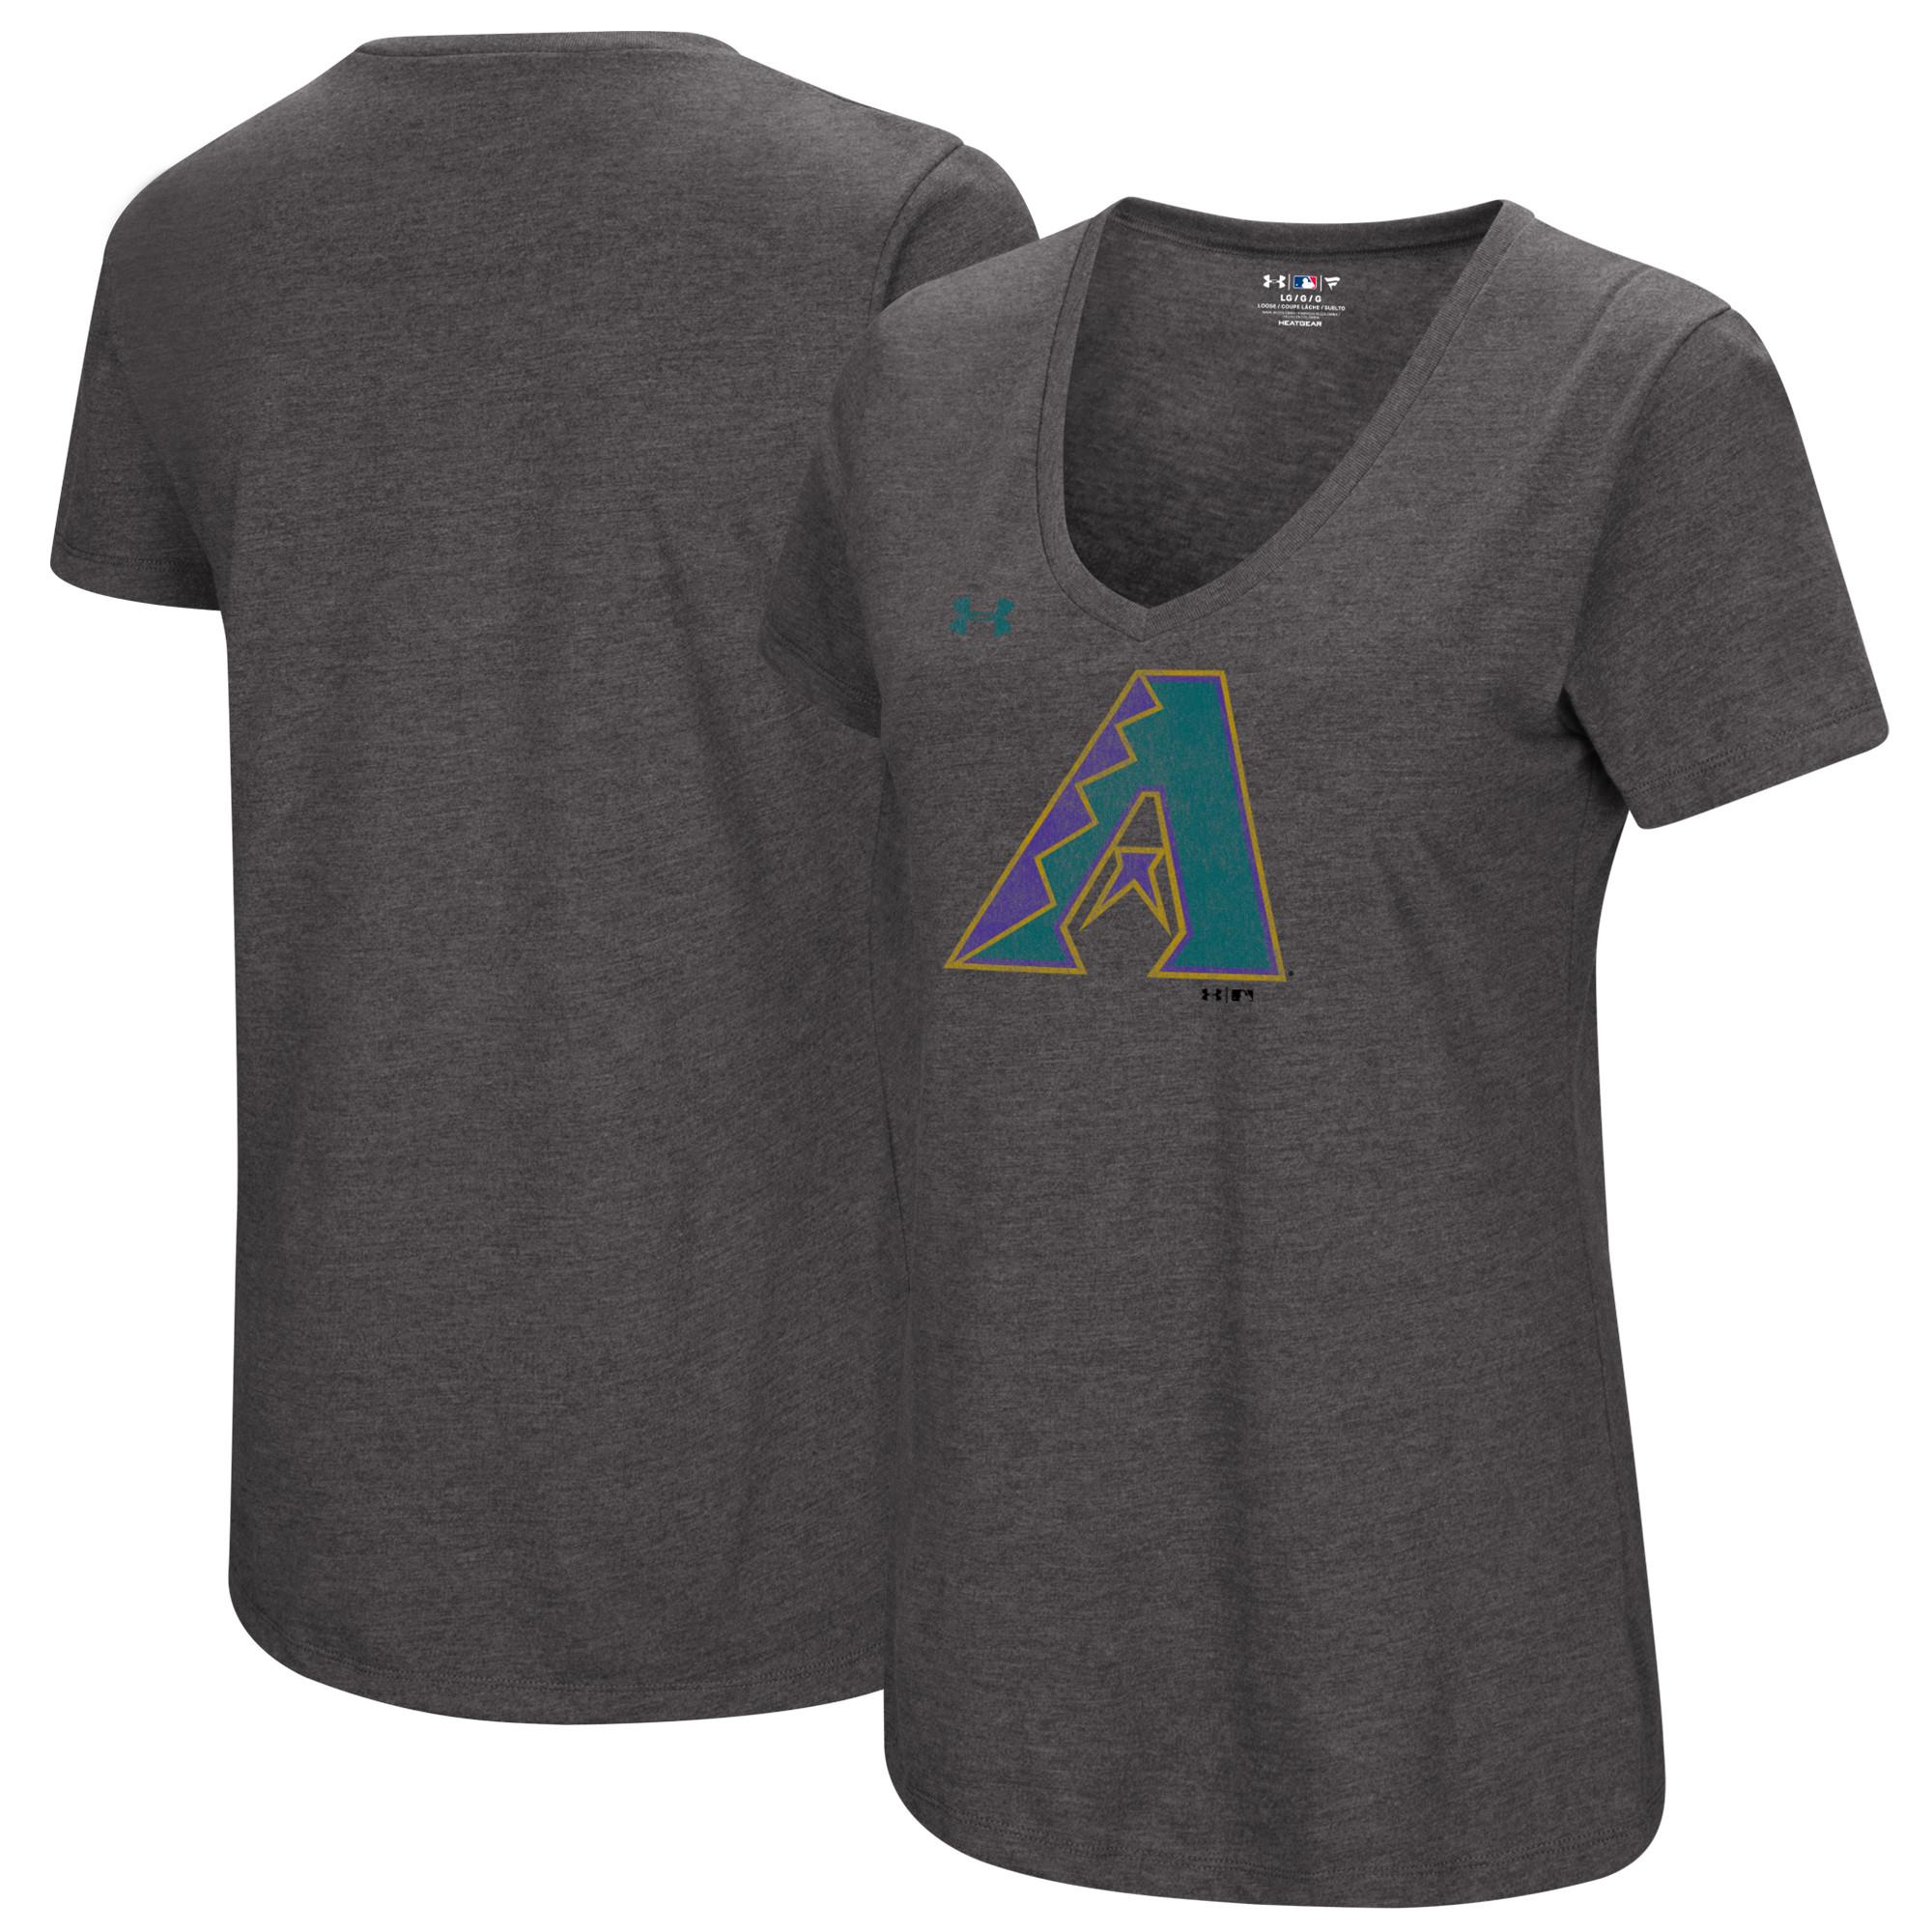 Arizona Diamondbacks Under Armour Women's Cooperstown Collection Logo Performance Tri-Blend V-Neck T-Shirt - Heathered Charcoal